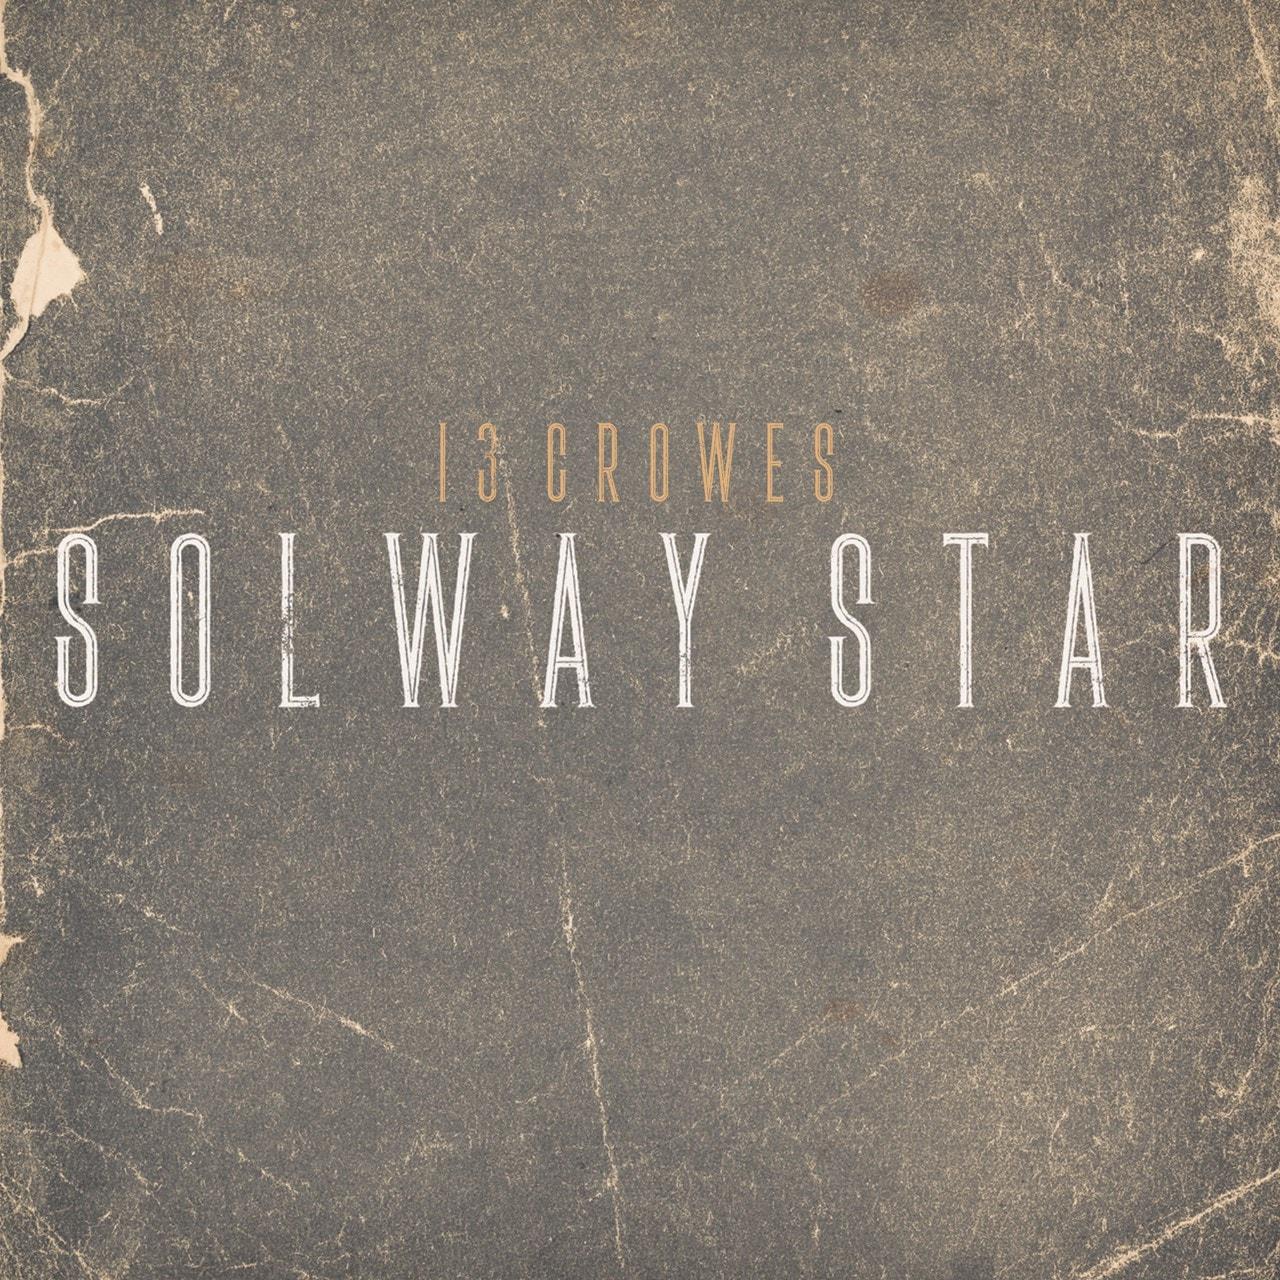 Solway Star - 1